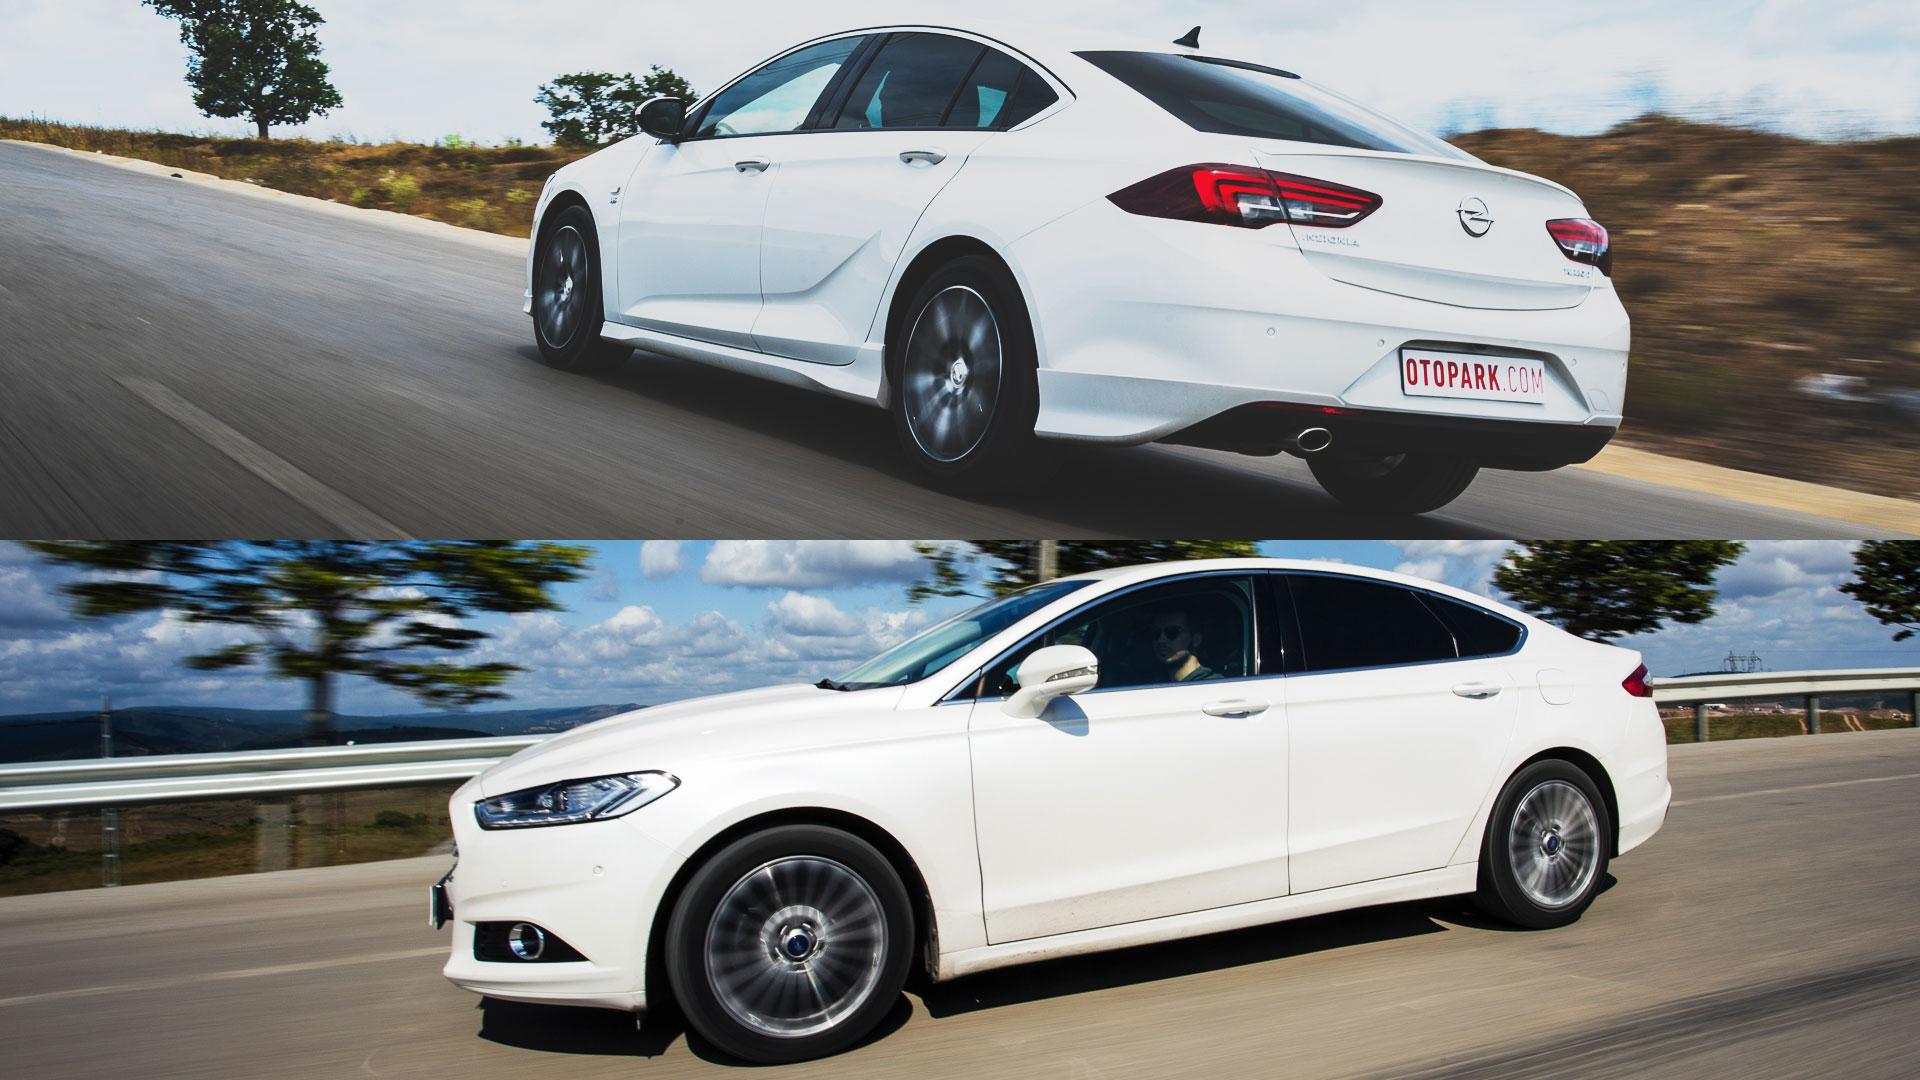 Photo of Premiumlaştırabildiklerimizden misiniz? | Insignia Grand Sport vs Ford Mondeo